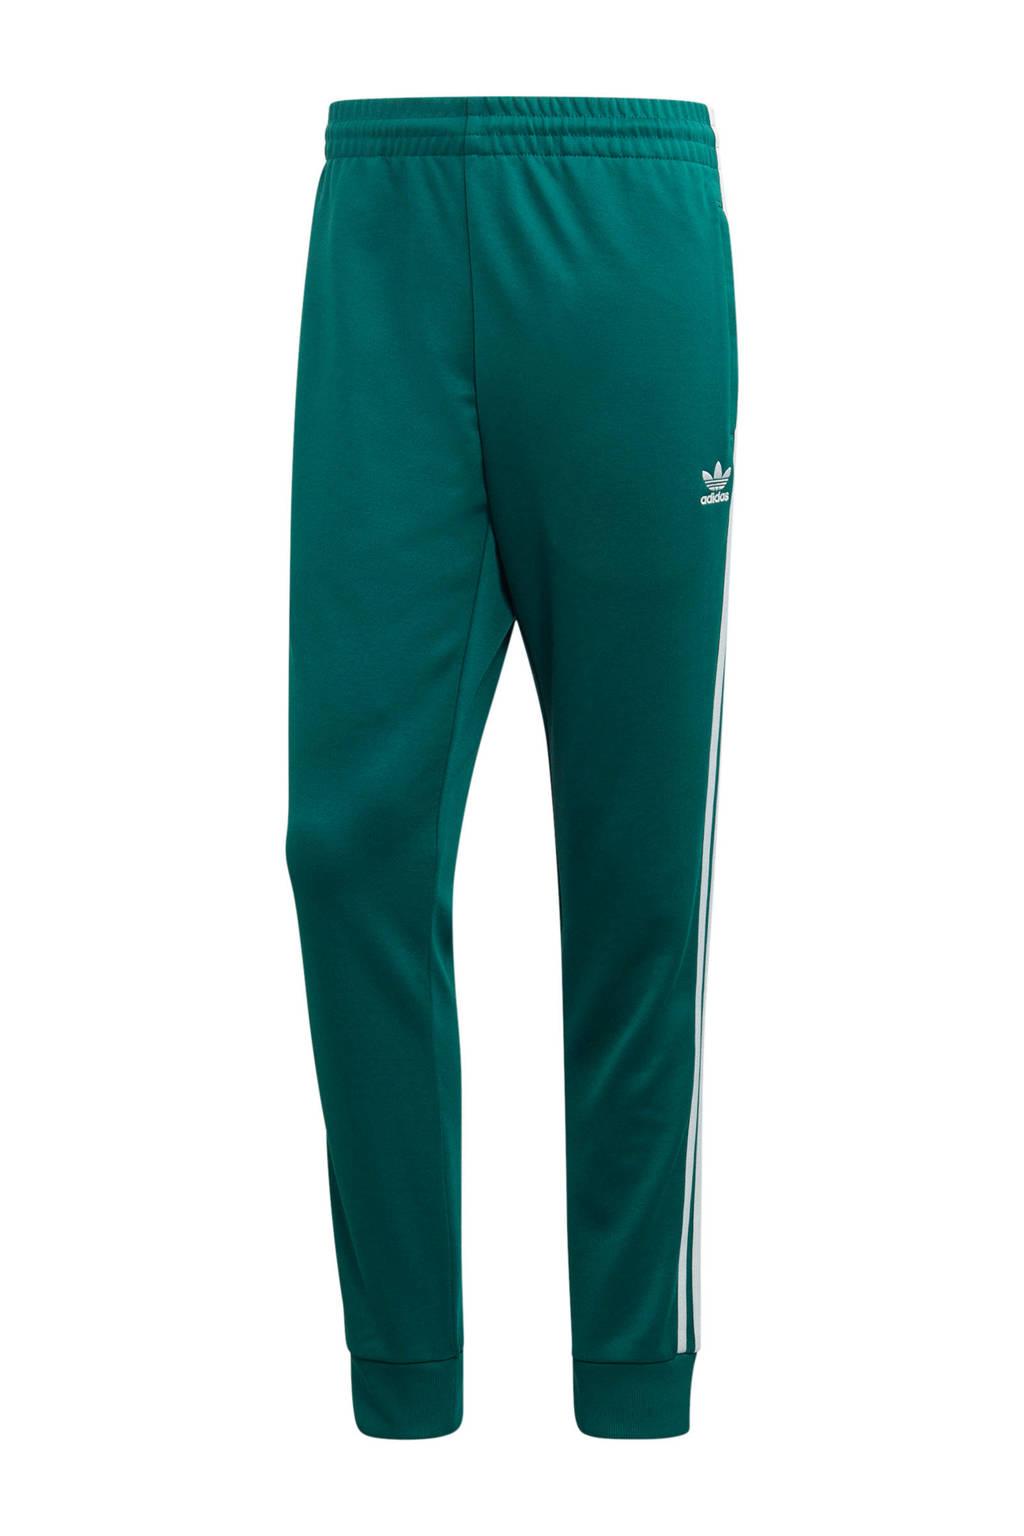 adidas originals Adicolor trainingsbroek groen, Groen/wit